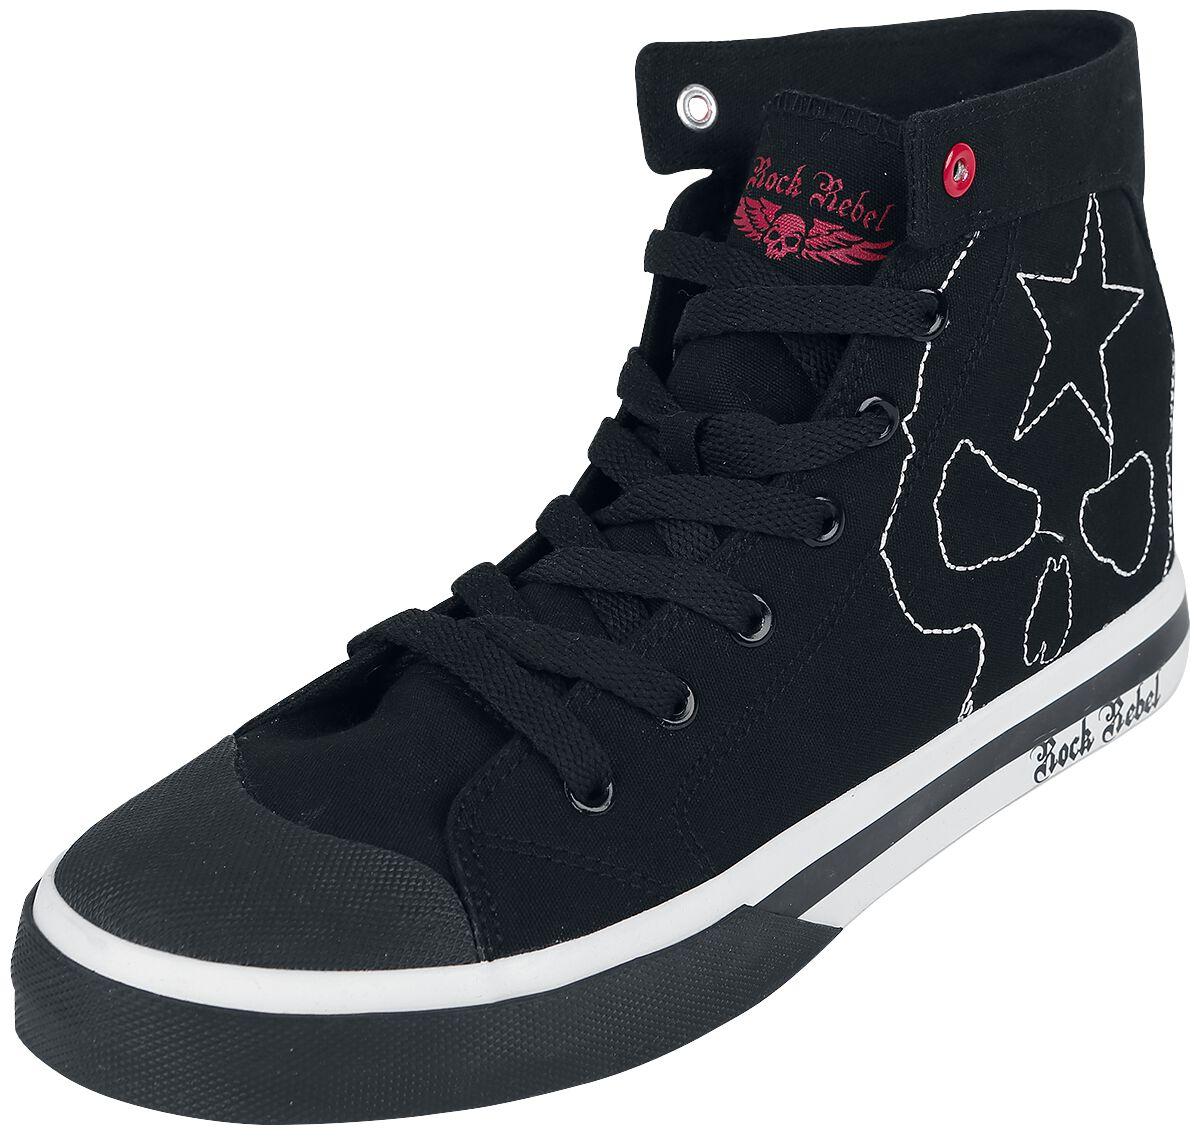 Sneakers für Frauen - Rock Rebel by EMP Walk The Line Sneaker schwarz  - Onlineshop EMP